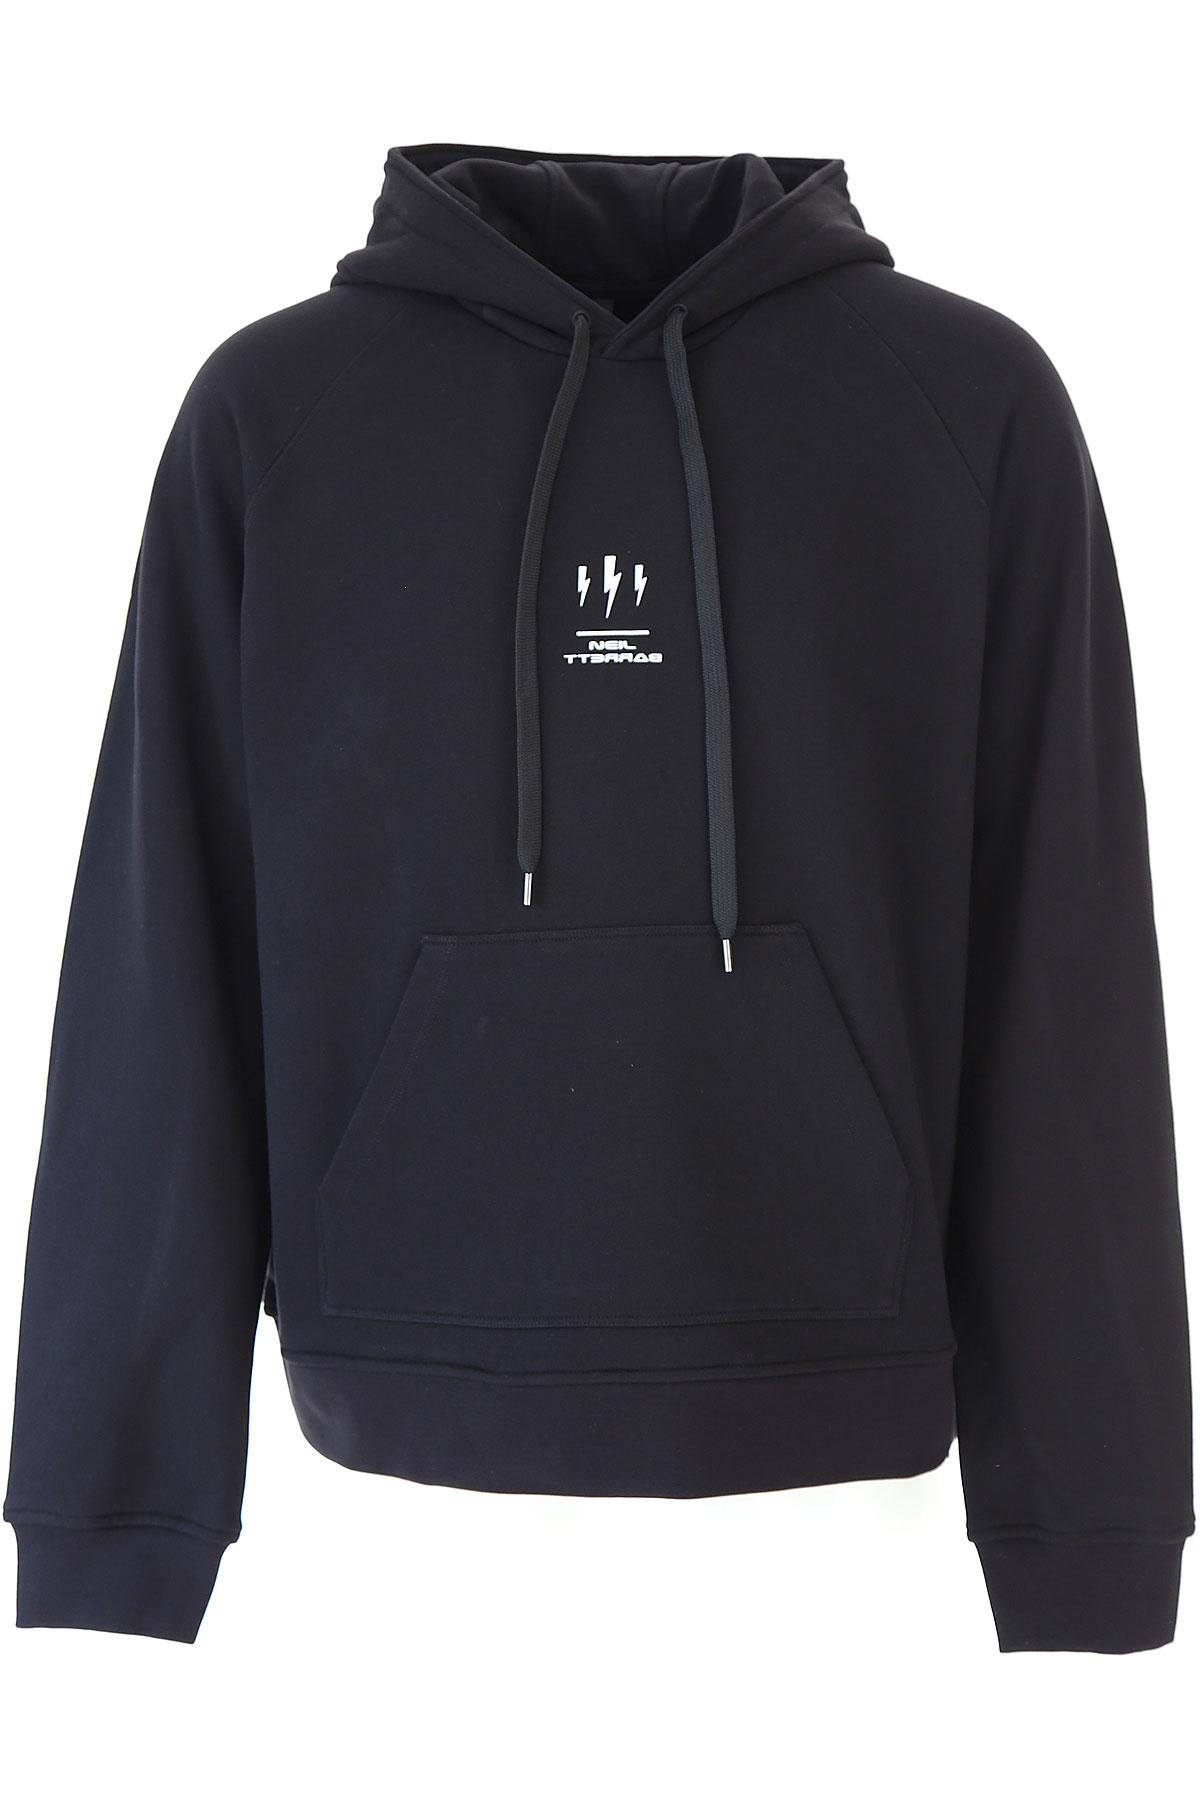 Neil Barrett Sweatshirt for Men On Sale, Black, Cotton, 2019, L M S